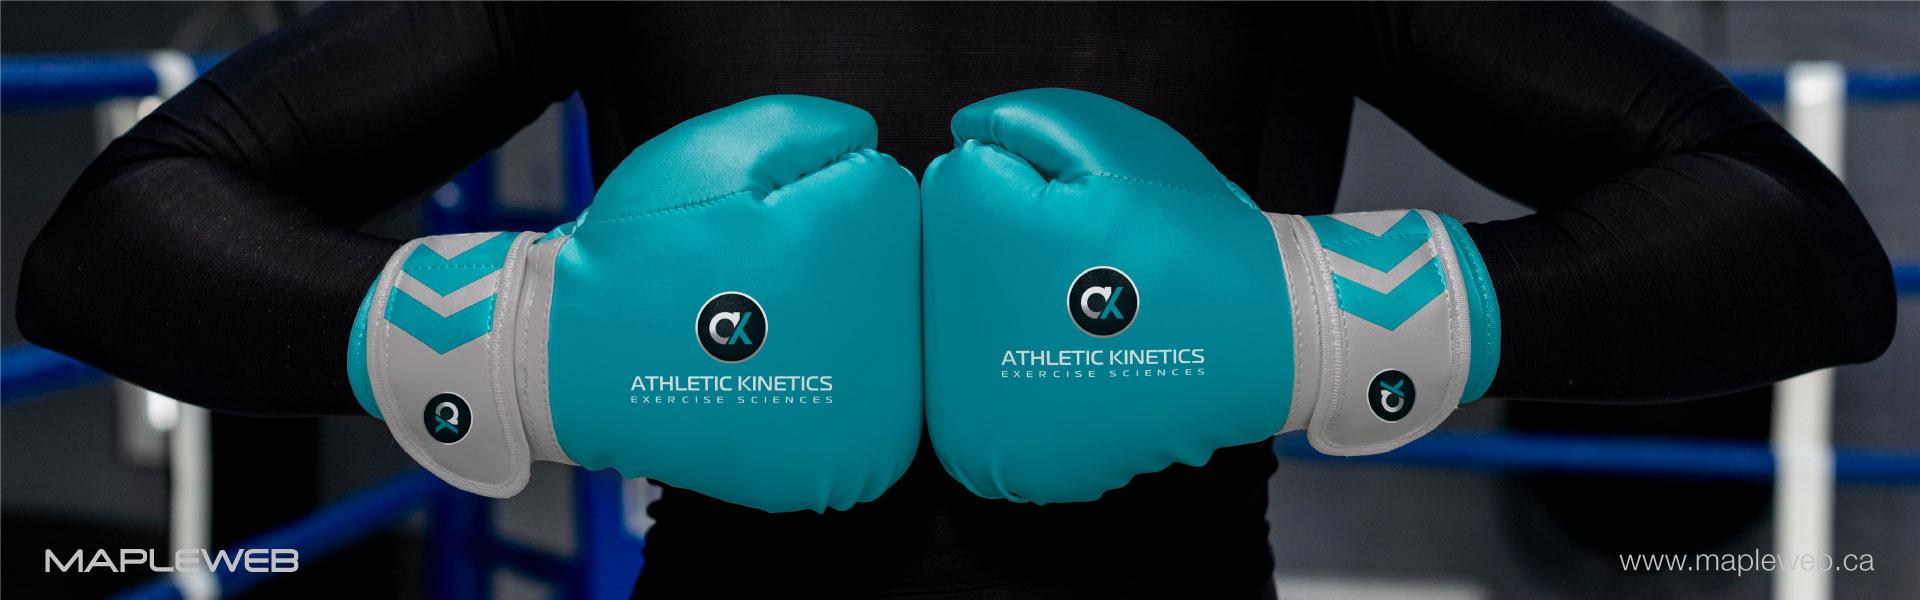 athletic-kinetics-brand-logo-design-by-mapleweb-vancouver-canada-gloves-mock